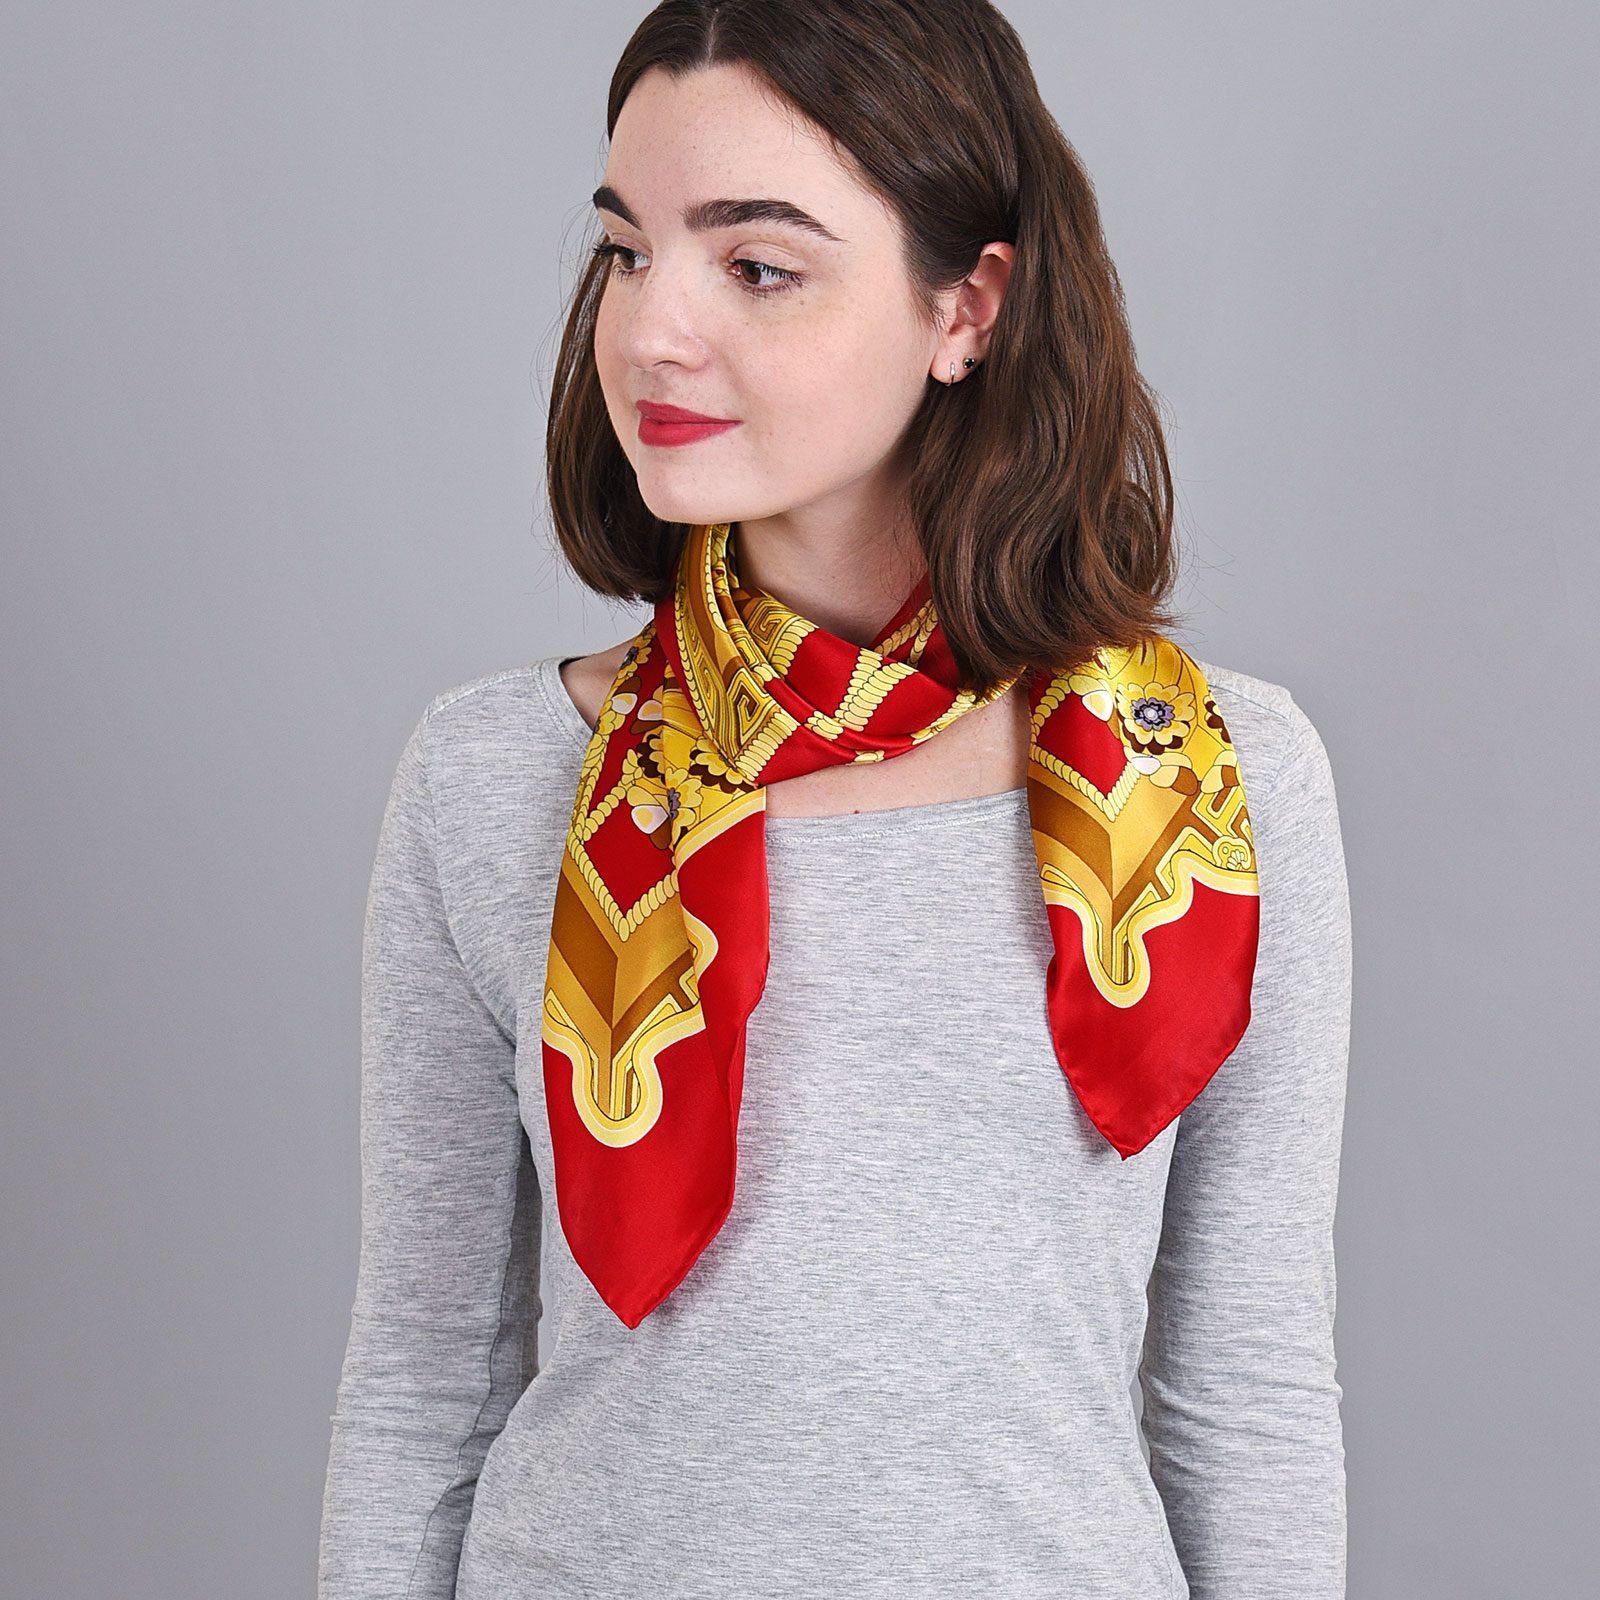 http://lookbook.allee-du-foulard.fr/wp-content/uploads/2018/09/AT-04053-VF16-carre-soie-rouge-jaune-1600x1600.jpg